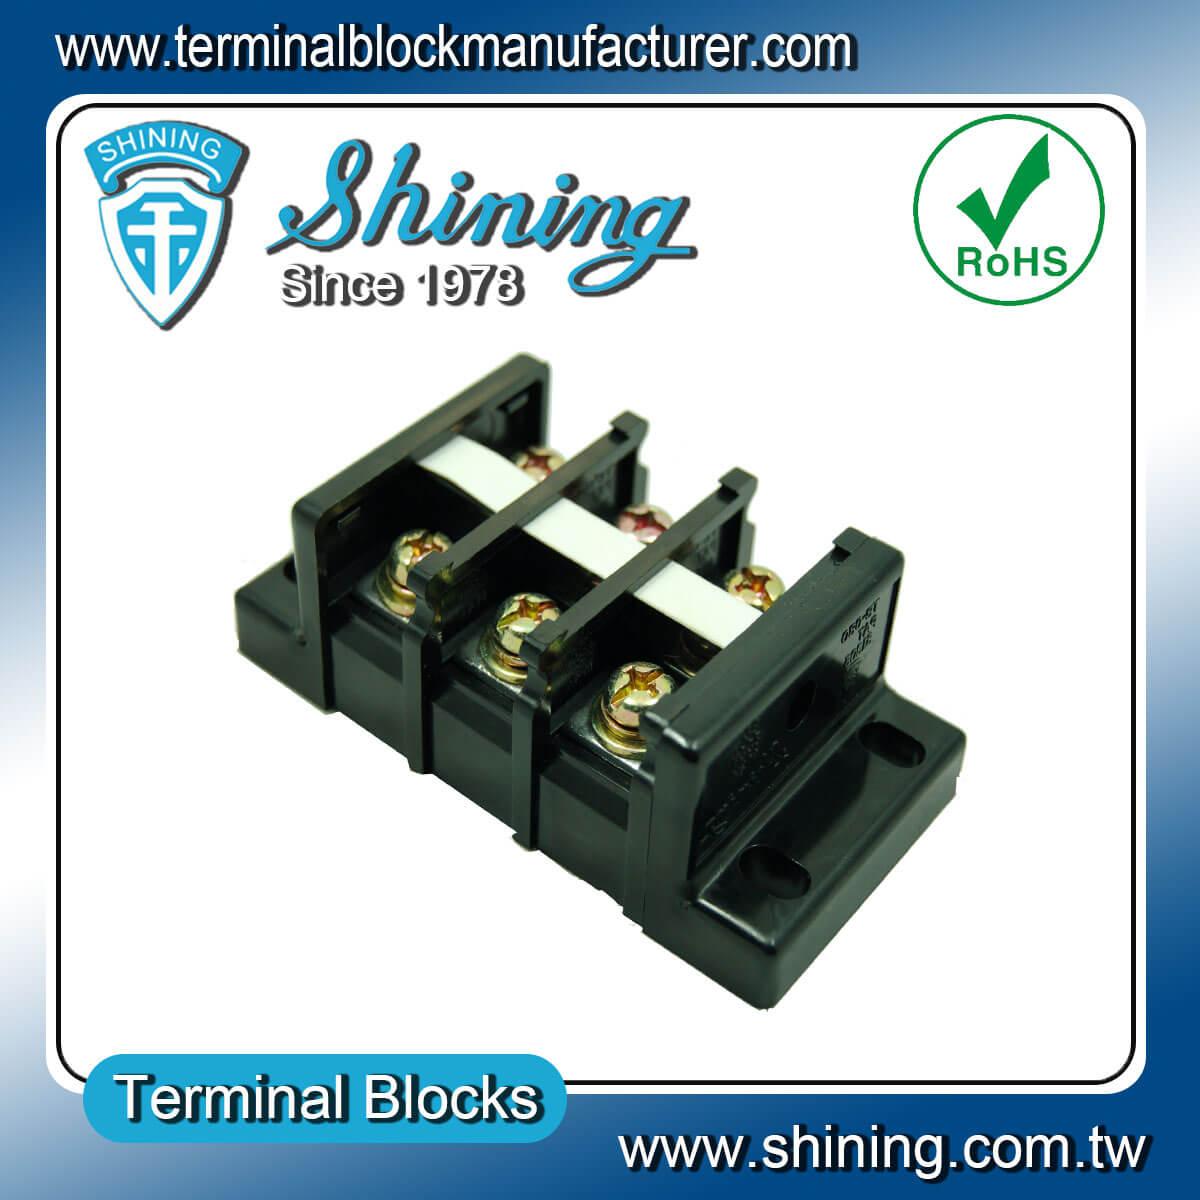 TB-100 600V 100A 組合式柵欄端子台